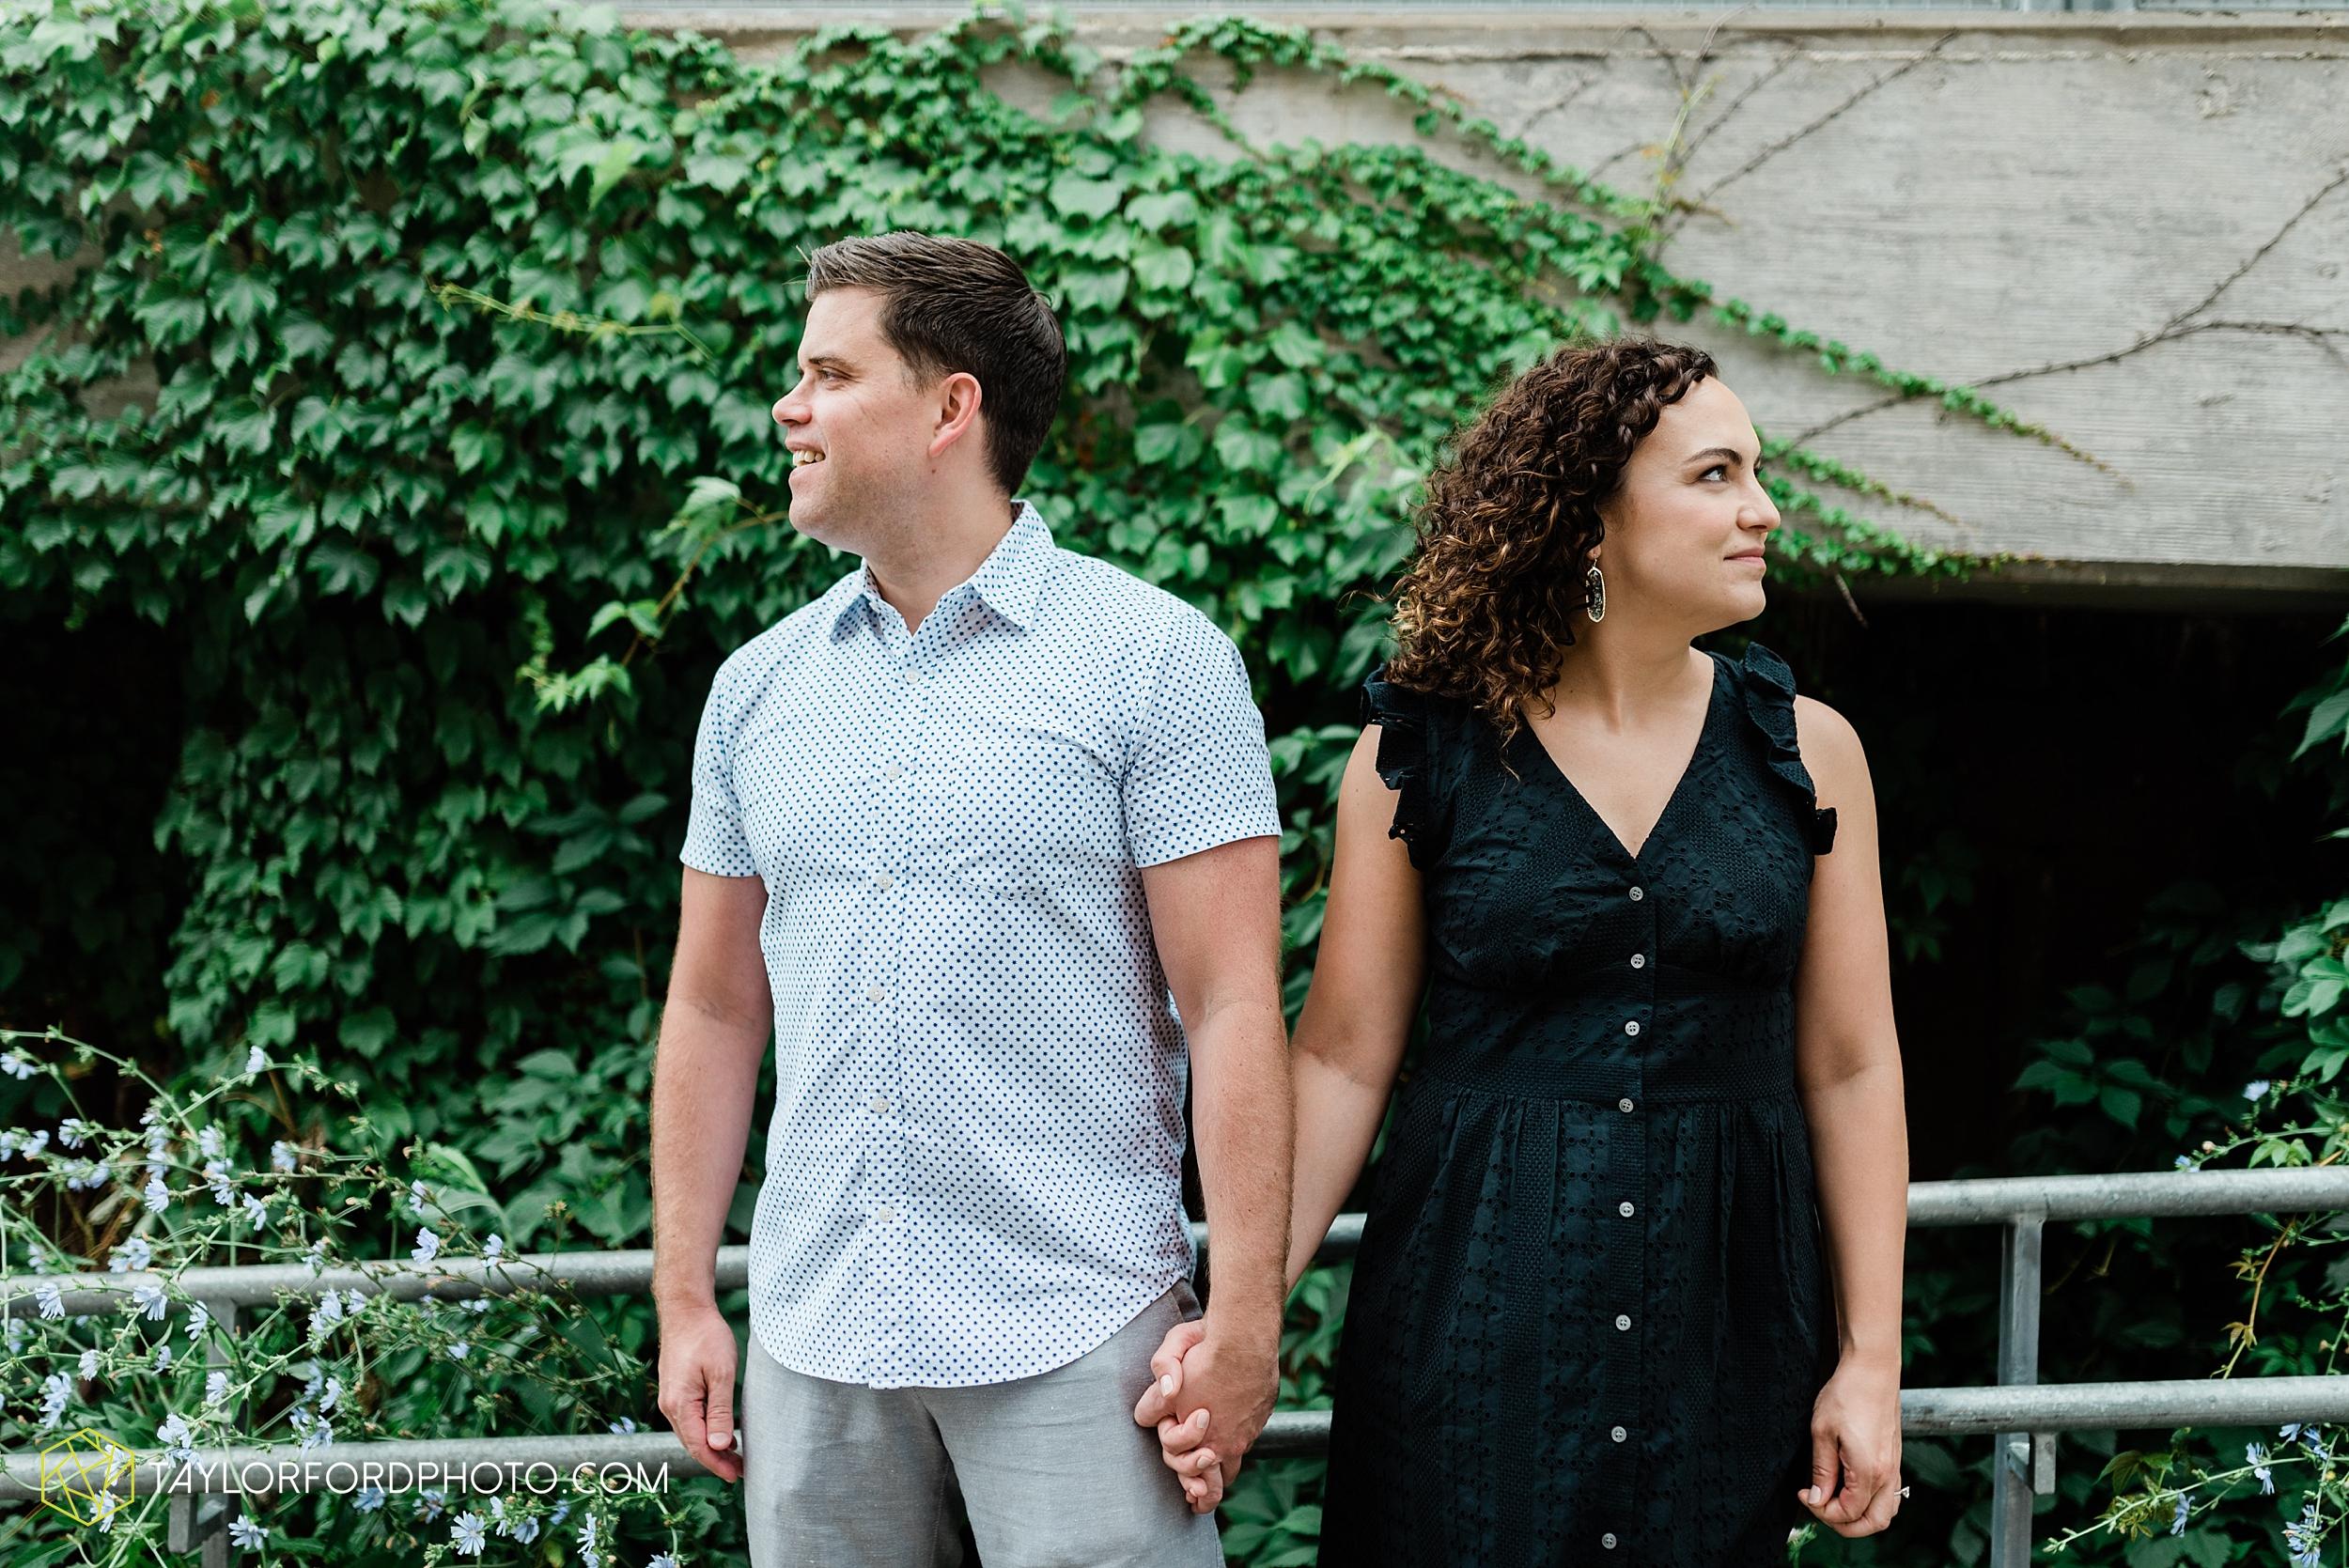 chicago-illinois-ipsento-606-high-line-wicker-park-bucktown-prosecutor-engagement-wedding-photographer-Taylor-Ford-Photography_8696.jpg